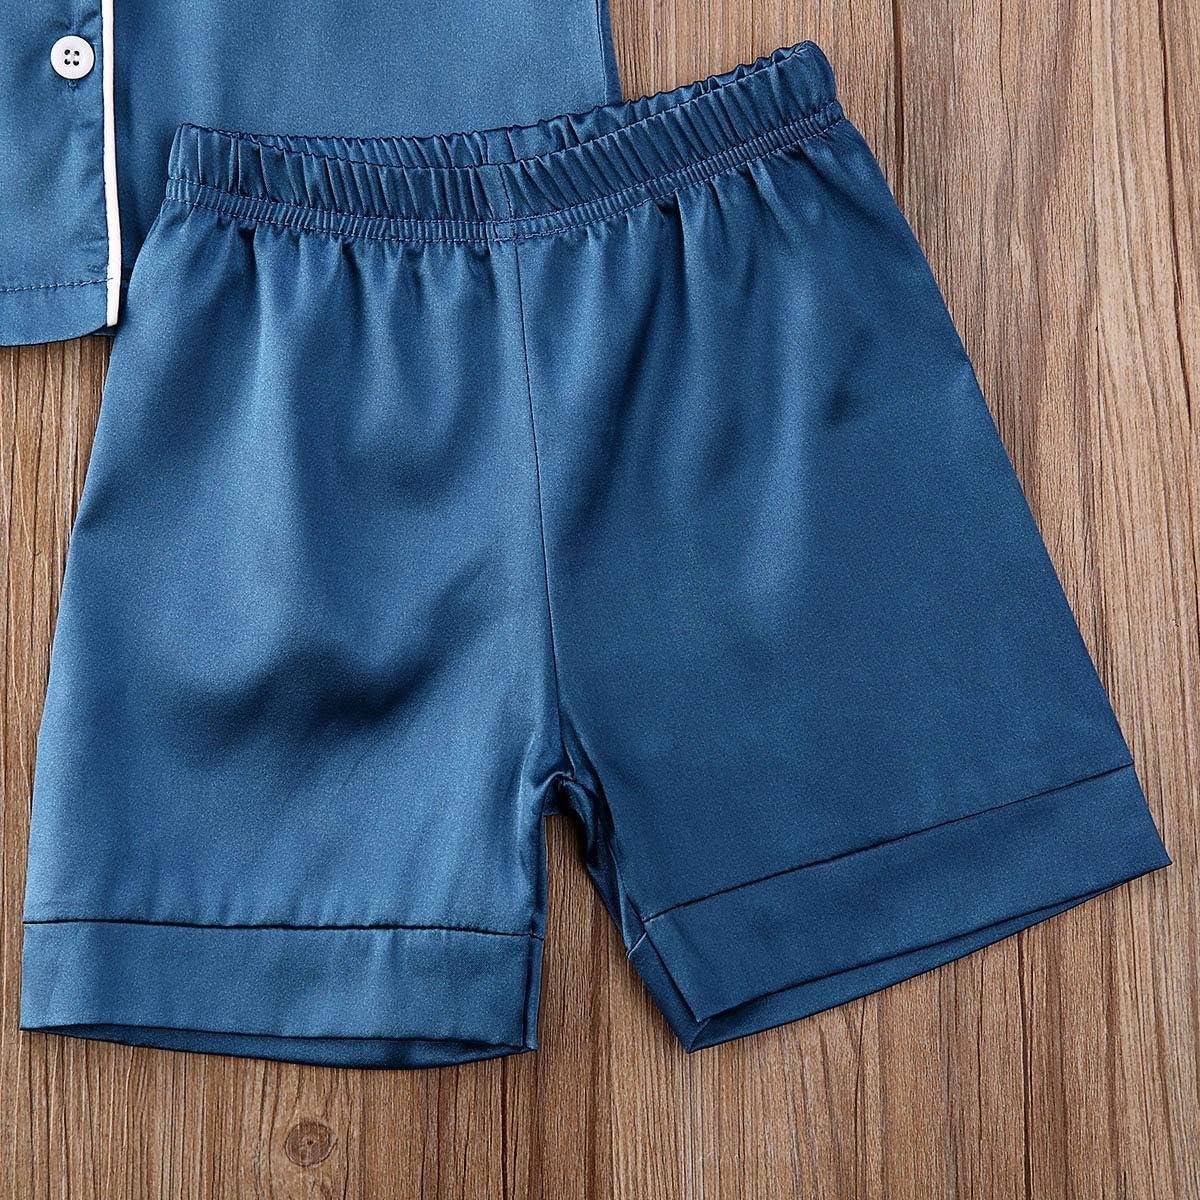 Mialoley 2Pcs Toddler Baby Boy Girl Satin Silk Pajamas Set Short Sleeve Button Down Pjs Kids Unisex Summer Sleepwear